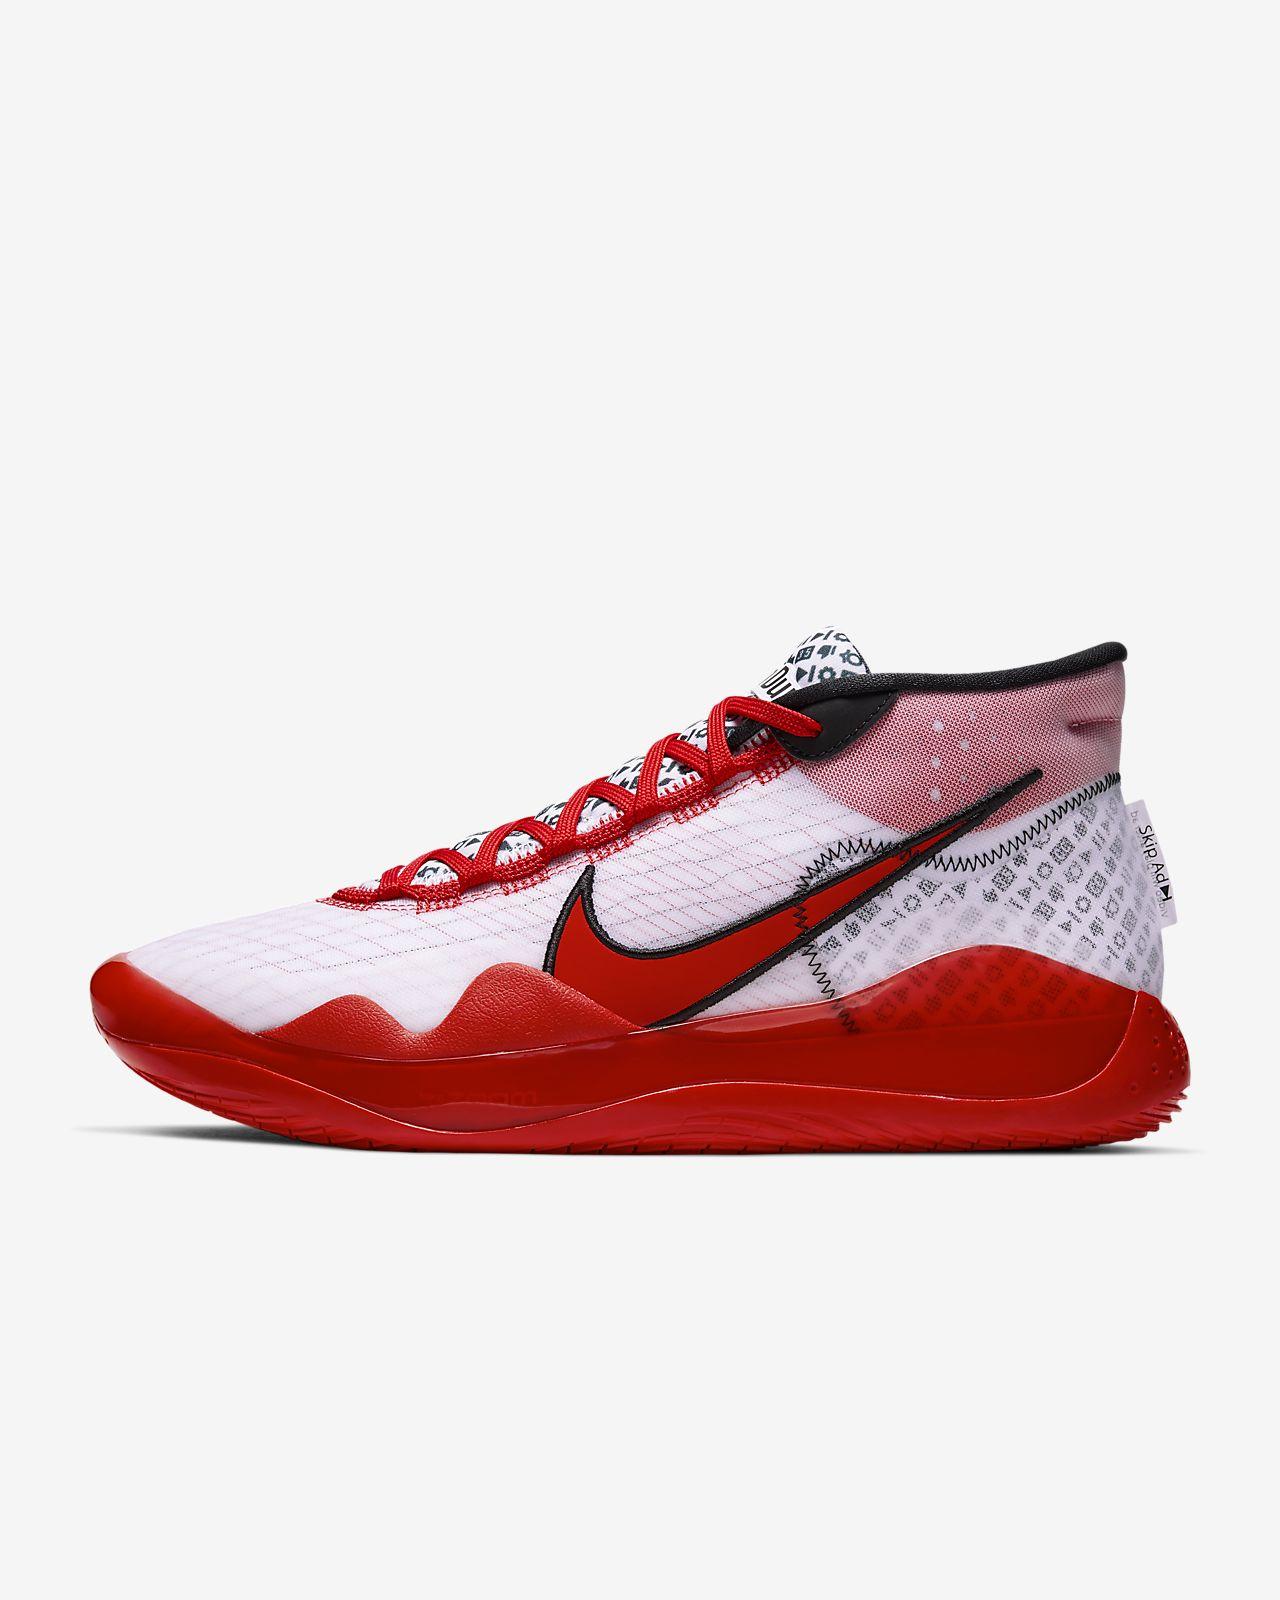 nike zapatillas hombre baloncesto kd